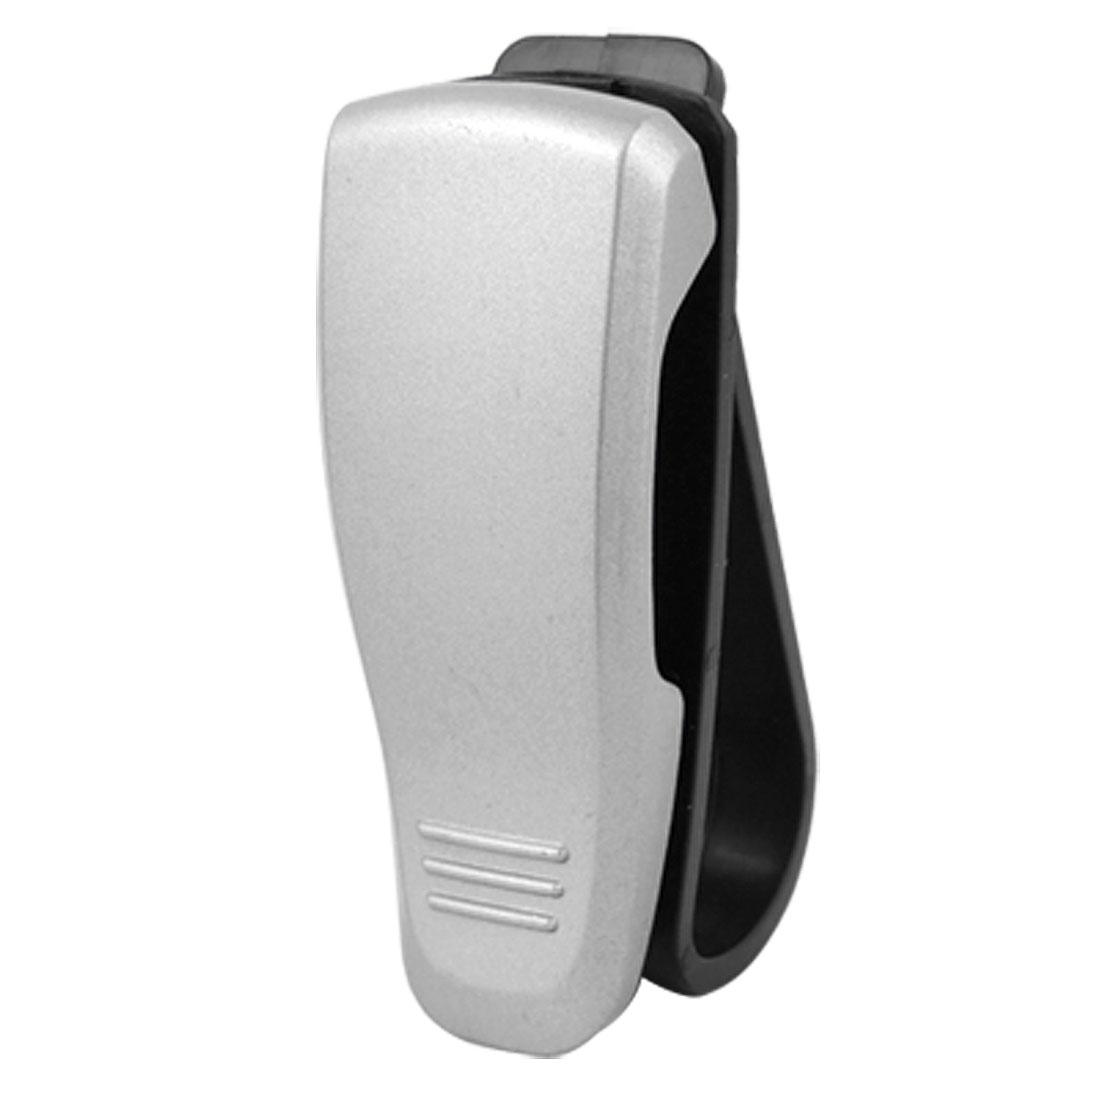 Car Visor Silver Tone Black Plastic Clip for Sunglasses